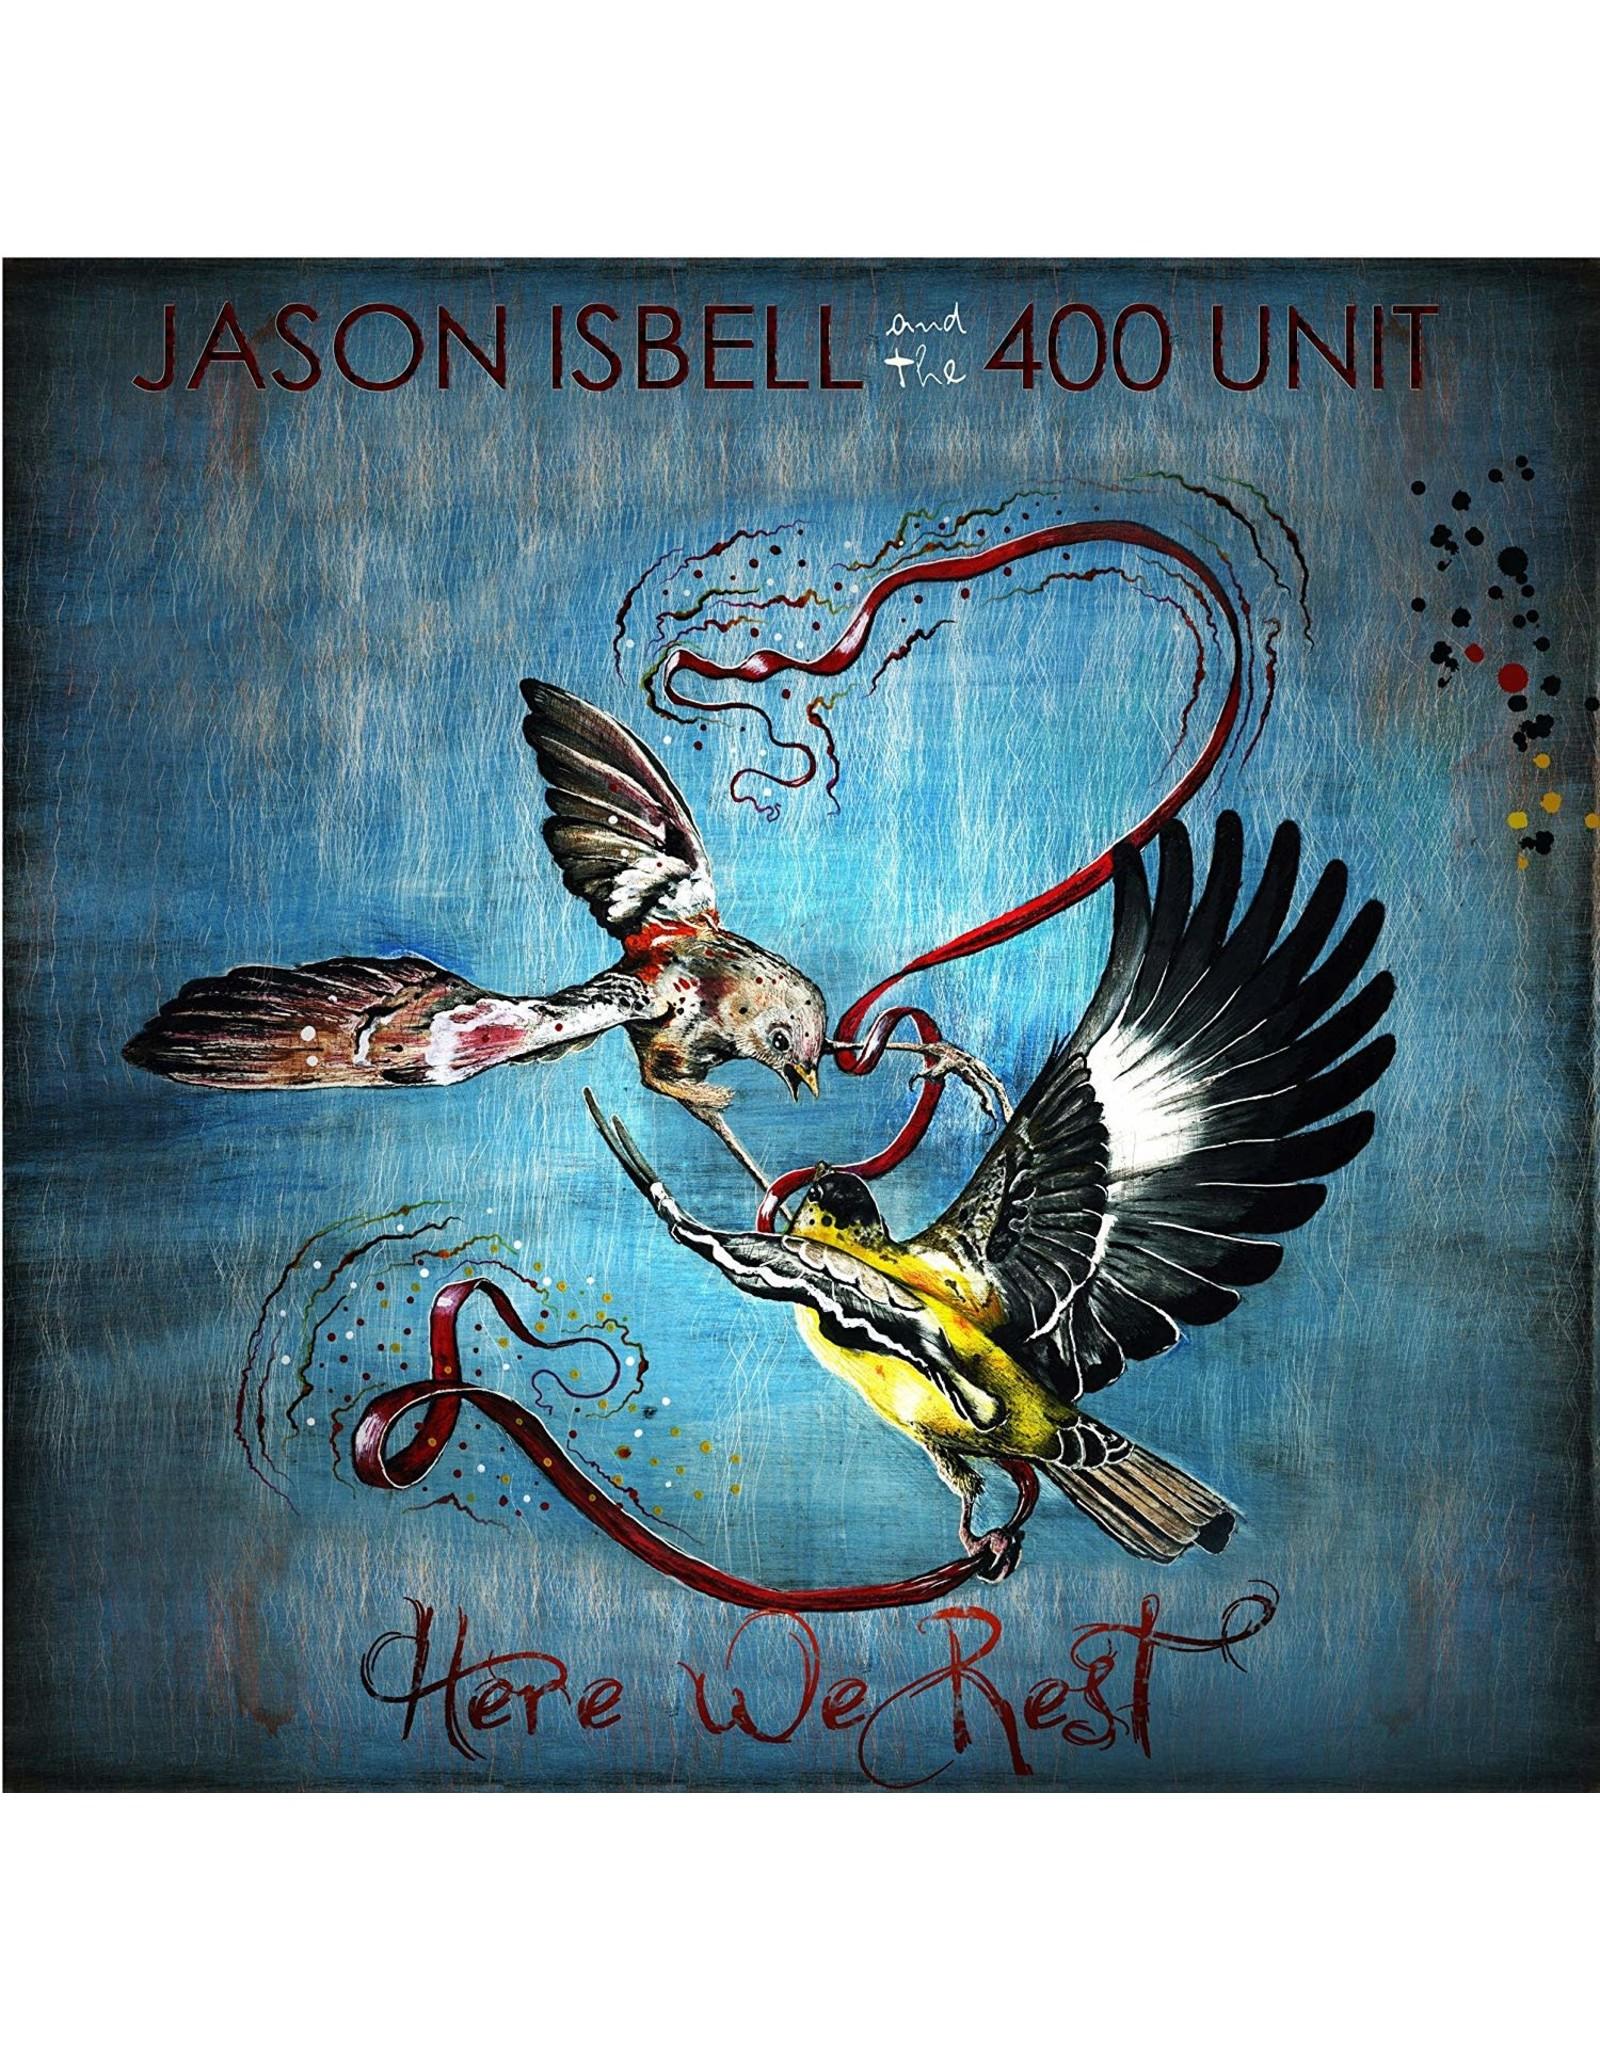 Jason Isbell & 400 Unit - Here We Rest